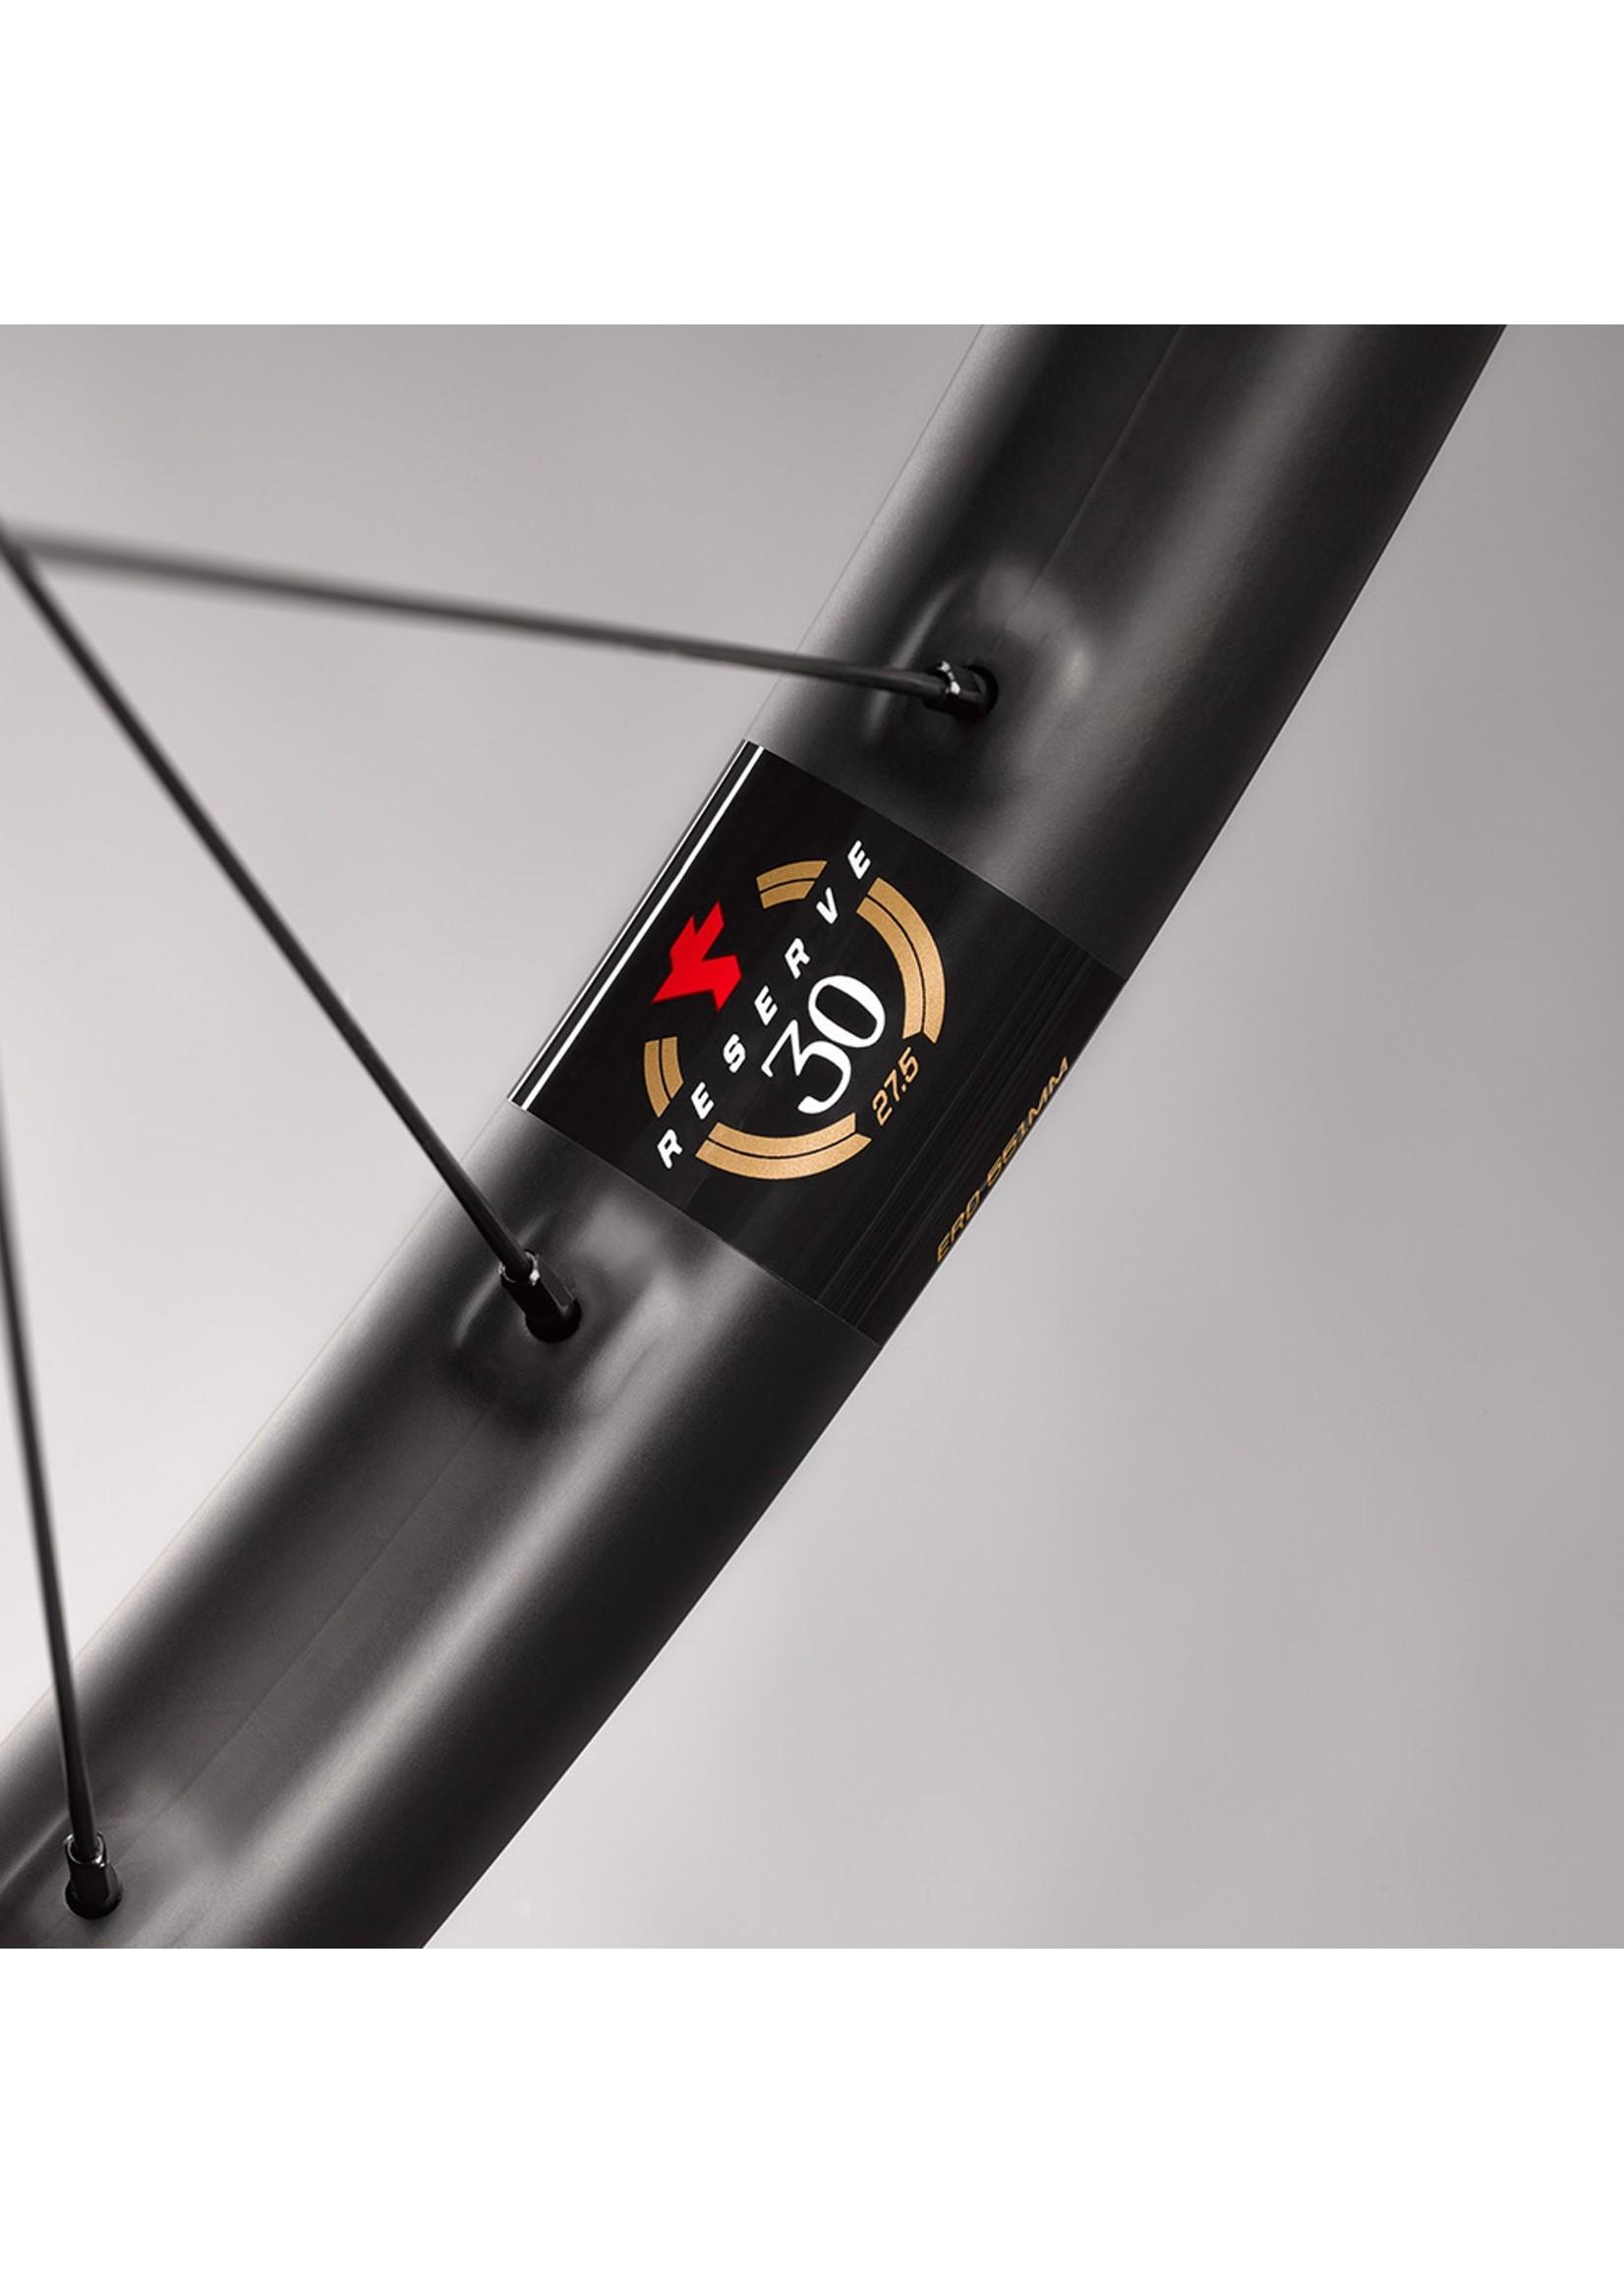 Santa Cruz Bicycles Reserve 30 MX   DT 350 110 MS 6b